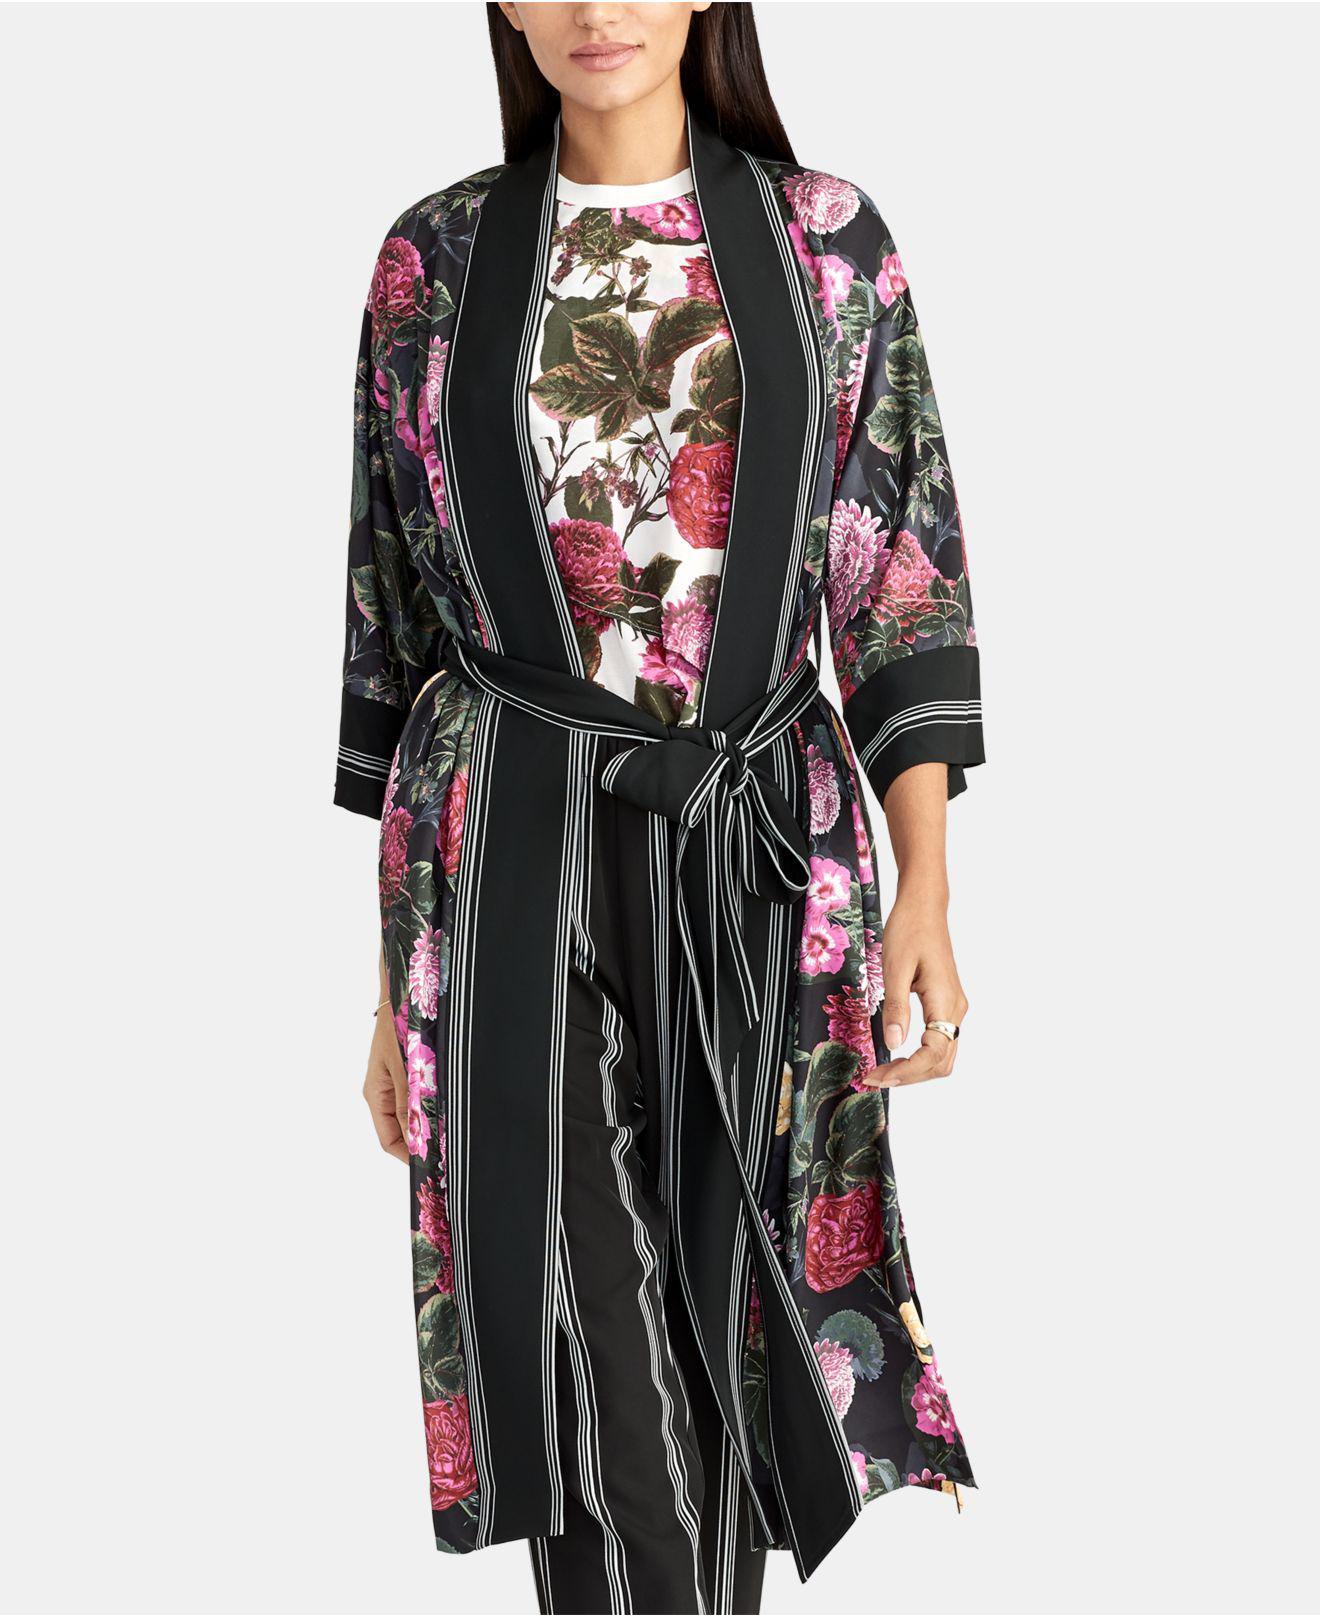 dbae65310926b Lyst - RACHEL Rachel Roy Archer Print Kimono in Black